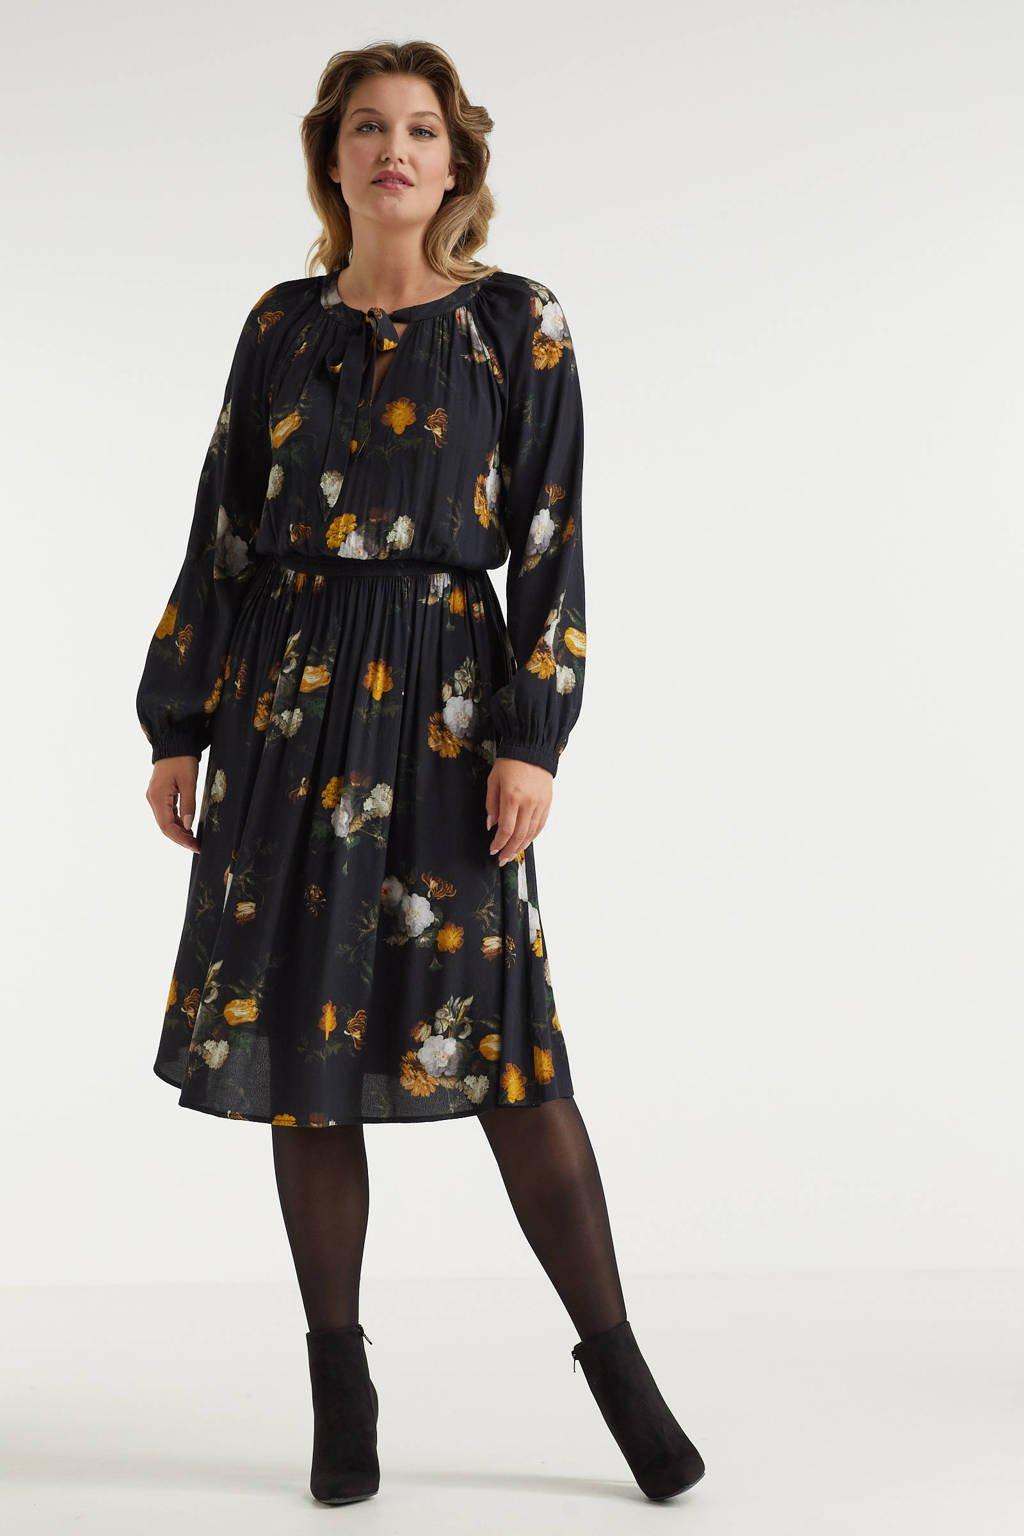 Miljuschka by Wehkamp limited edition jurk met smock bloemenprint, Zwart / Geel